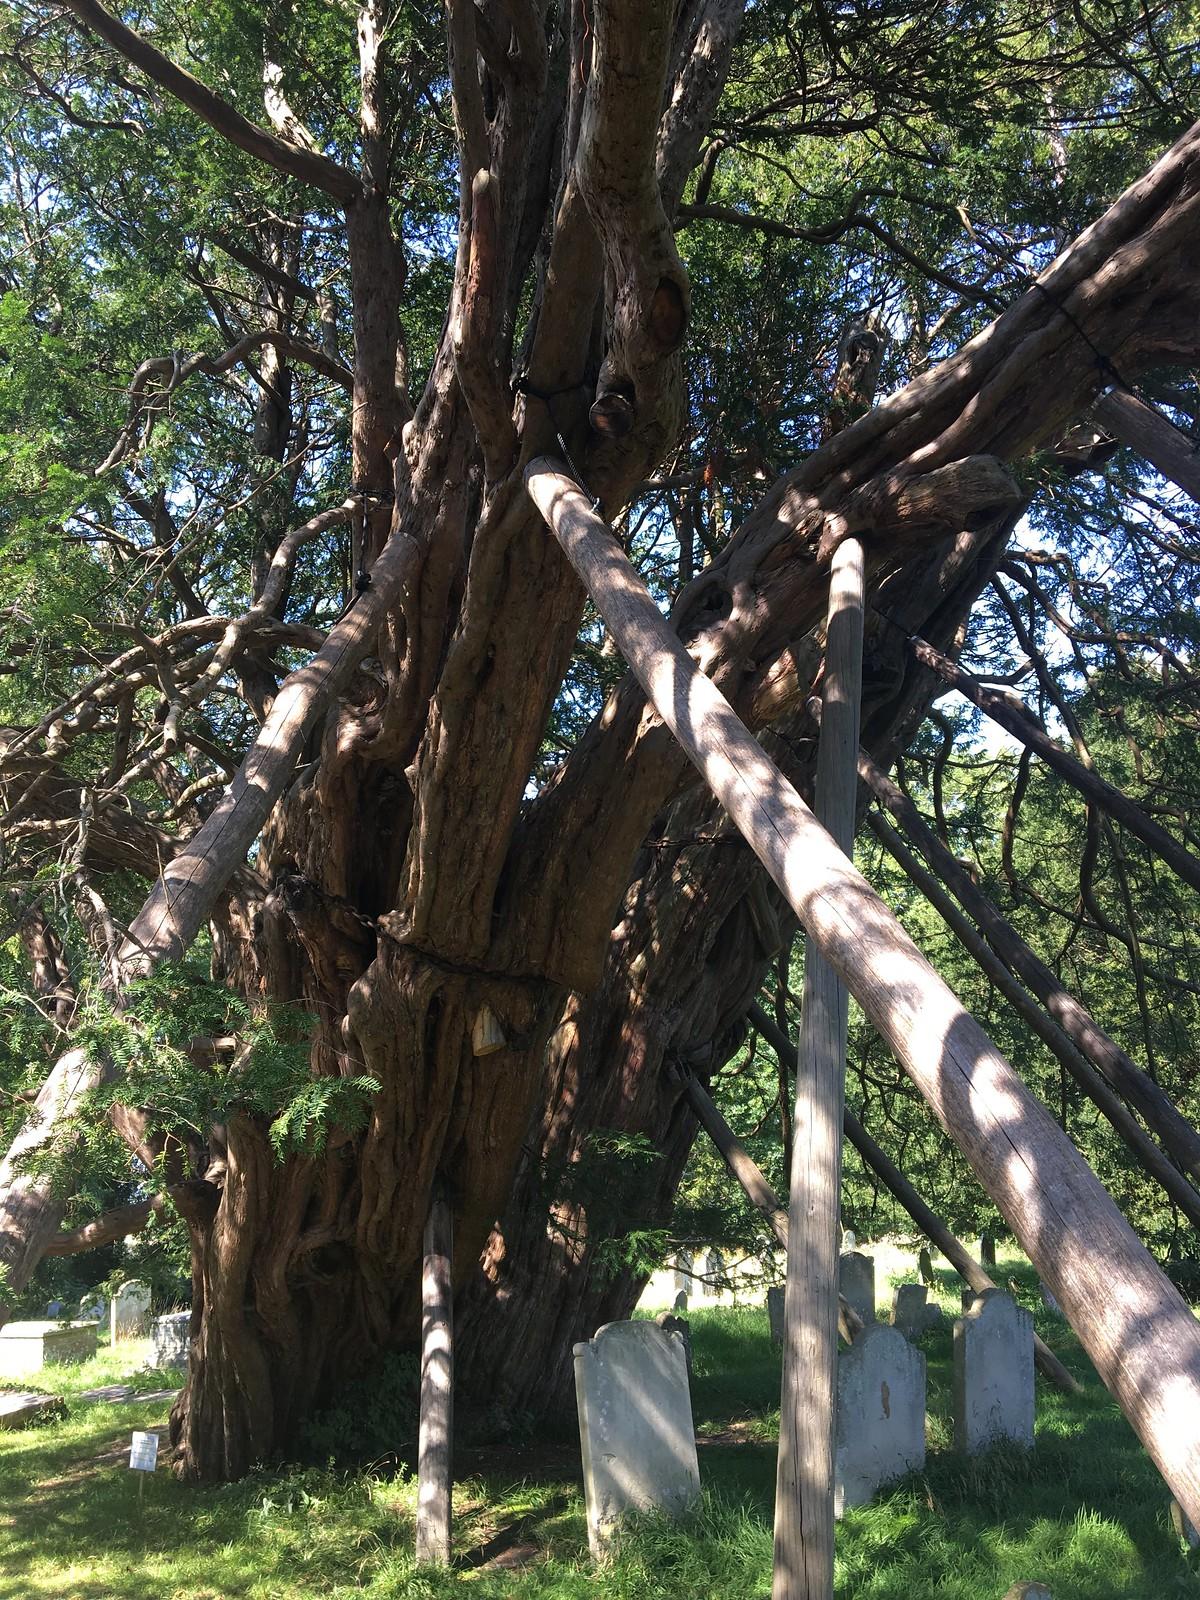 August 25, 2019: Berwick to Eastbourne Wilmington Church yew tree